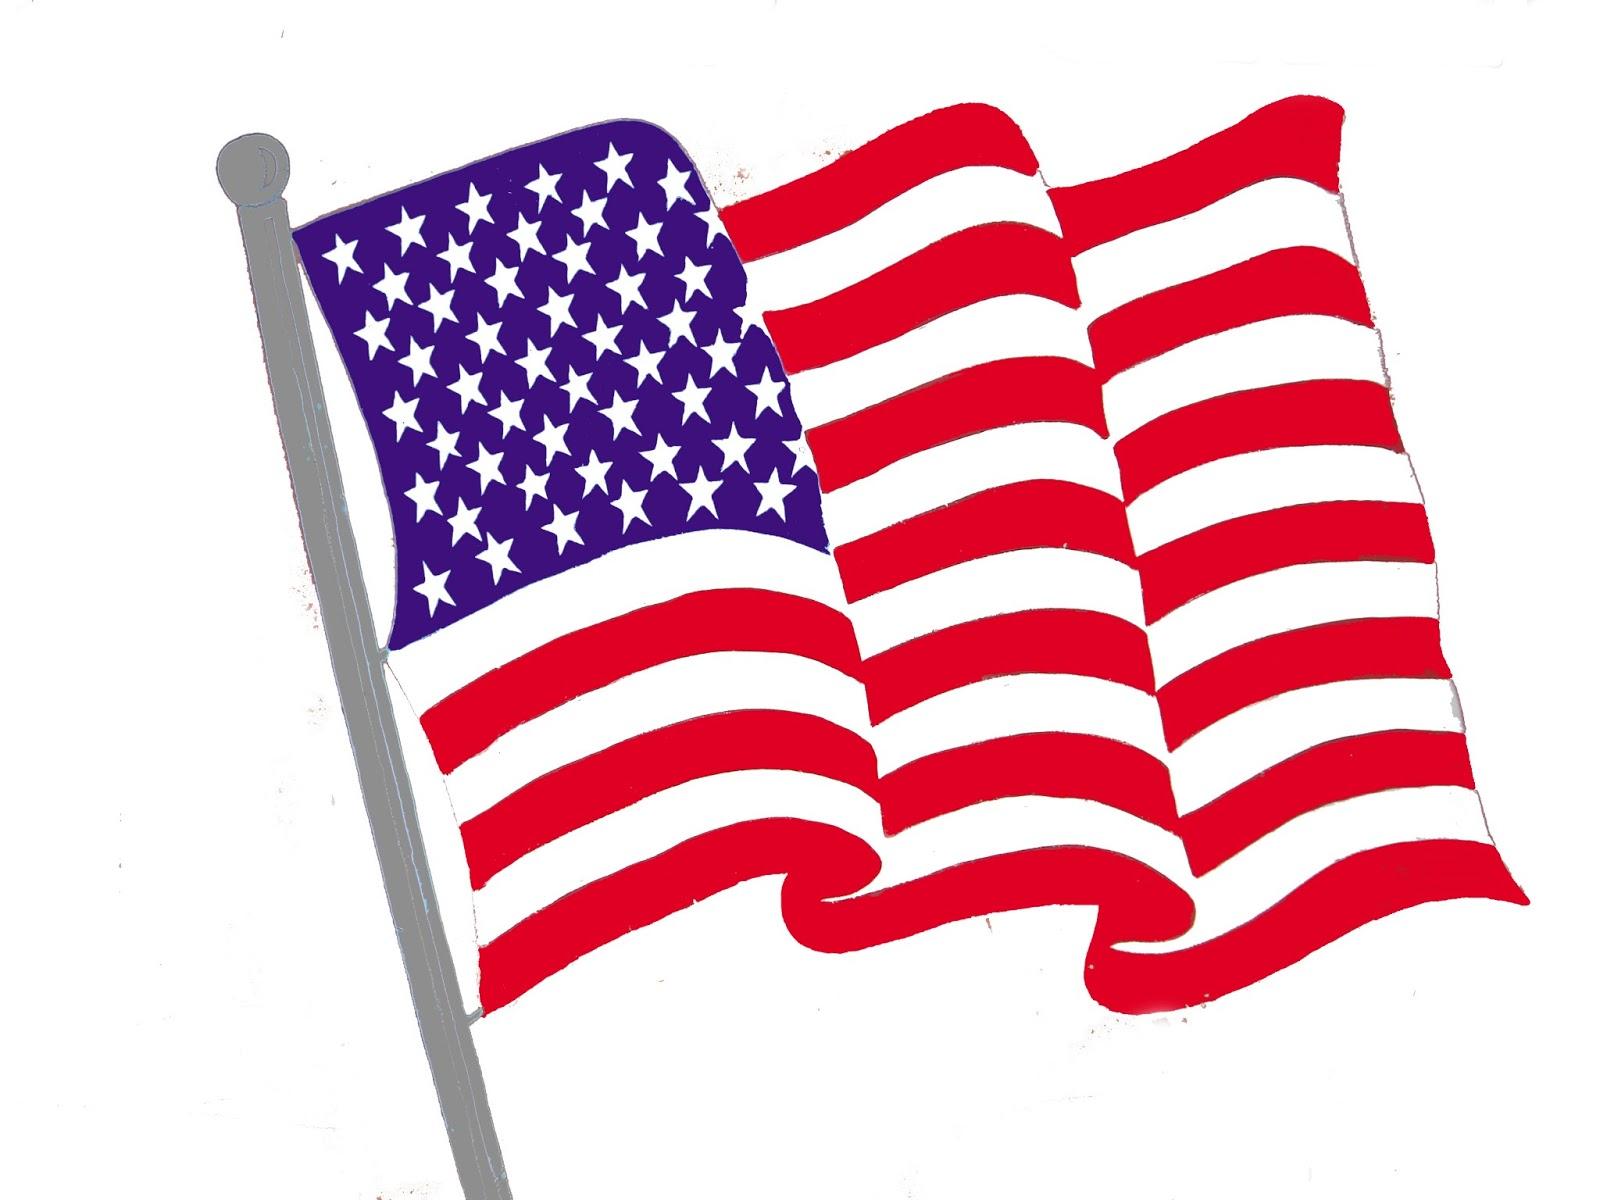 1600x1200 America Clipart Usa Flag